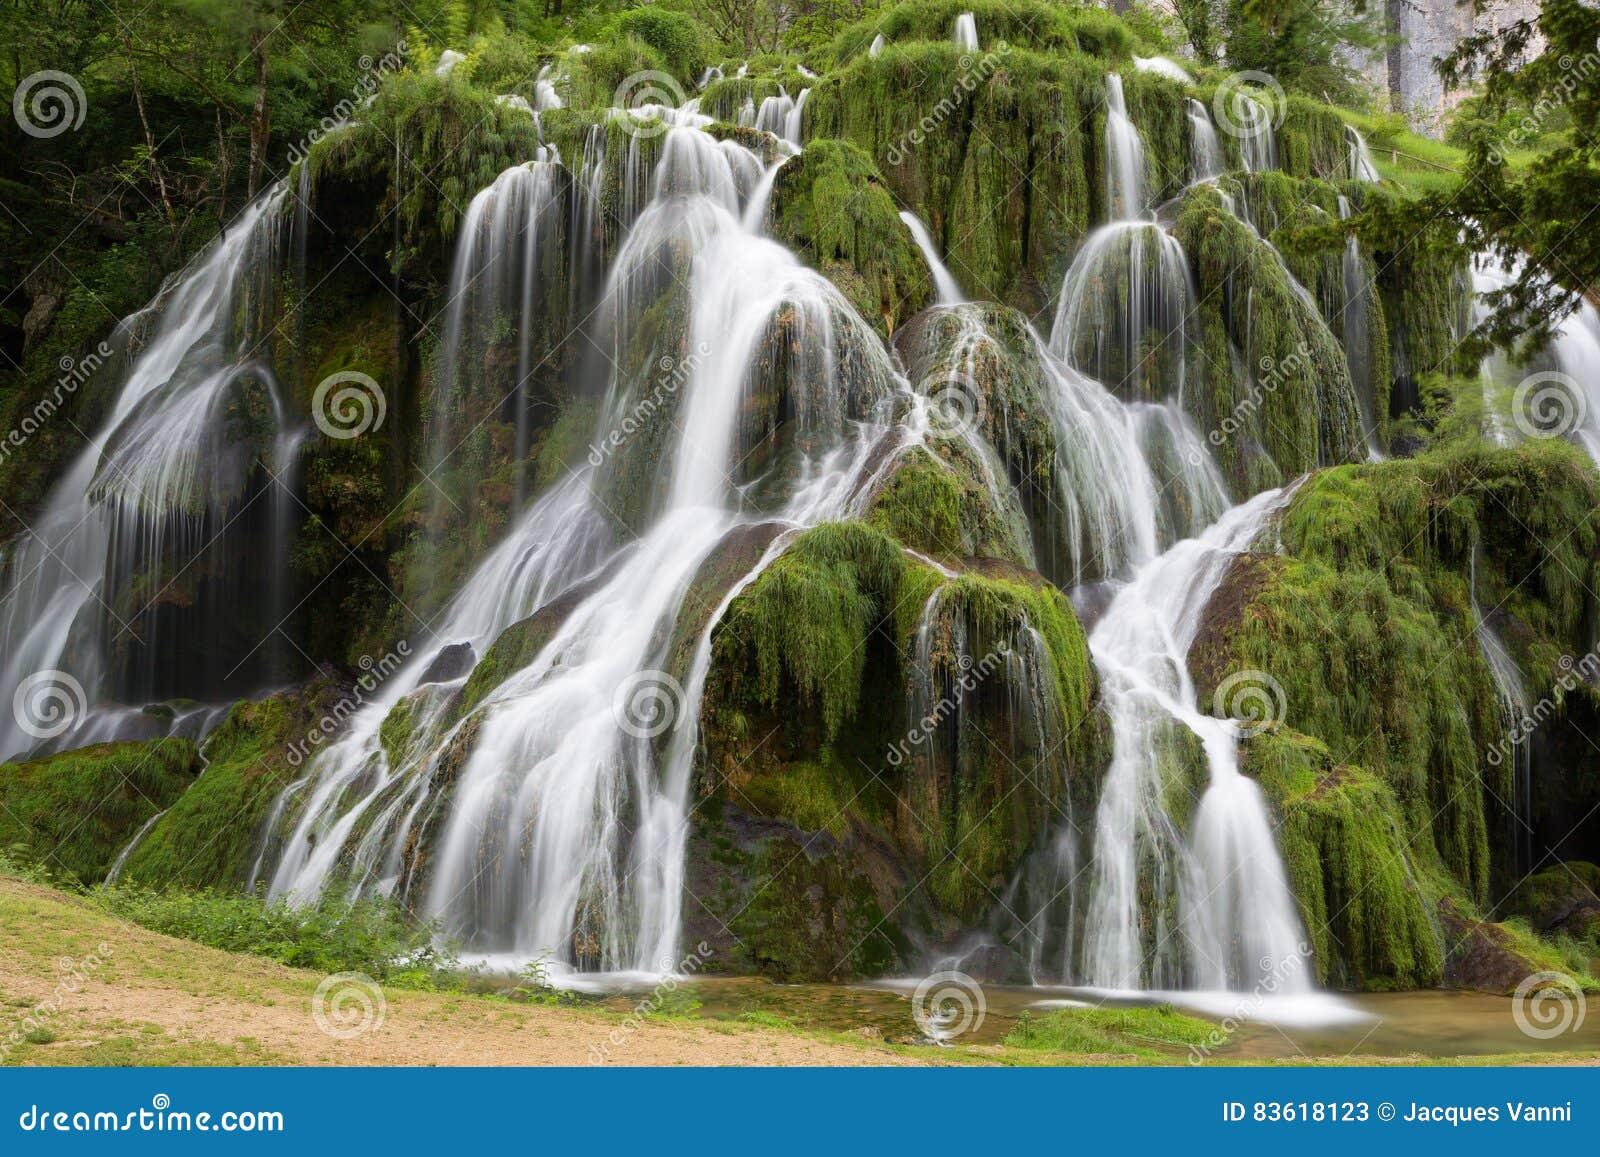 Waterfalls of Baume-Les-Messieurs - Jura - France